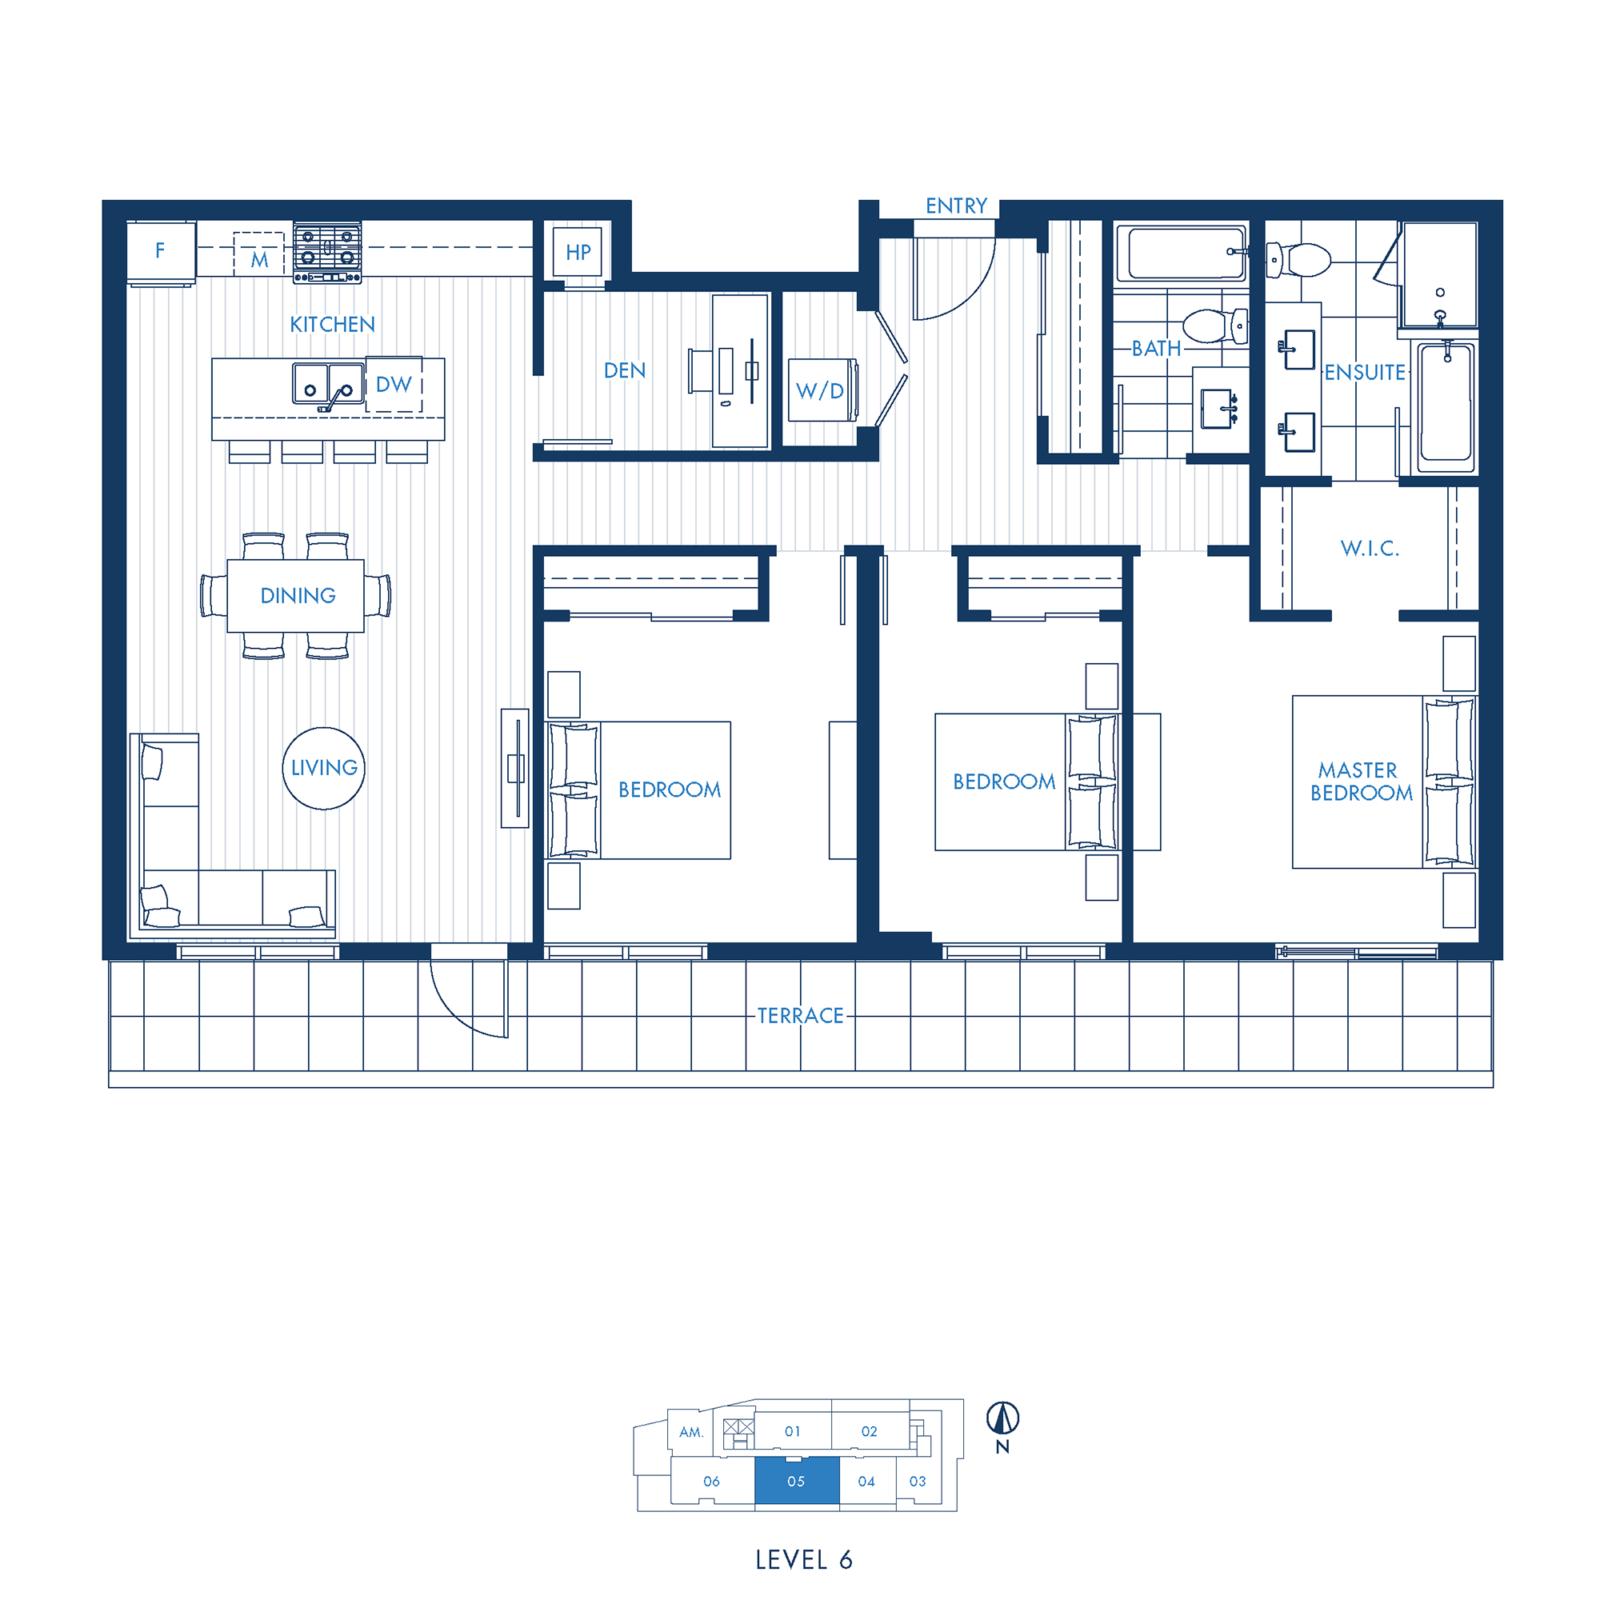 North Building Plan L